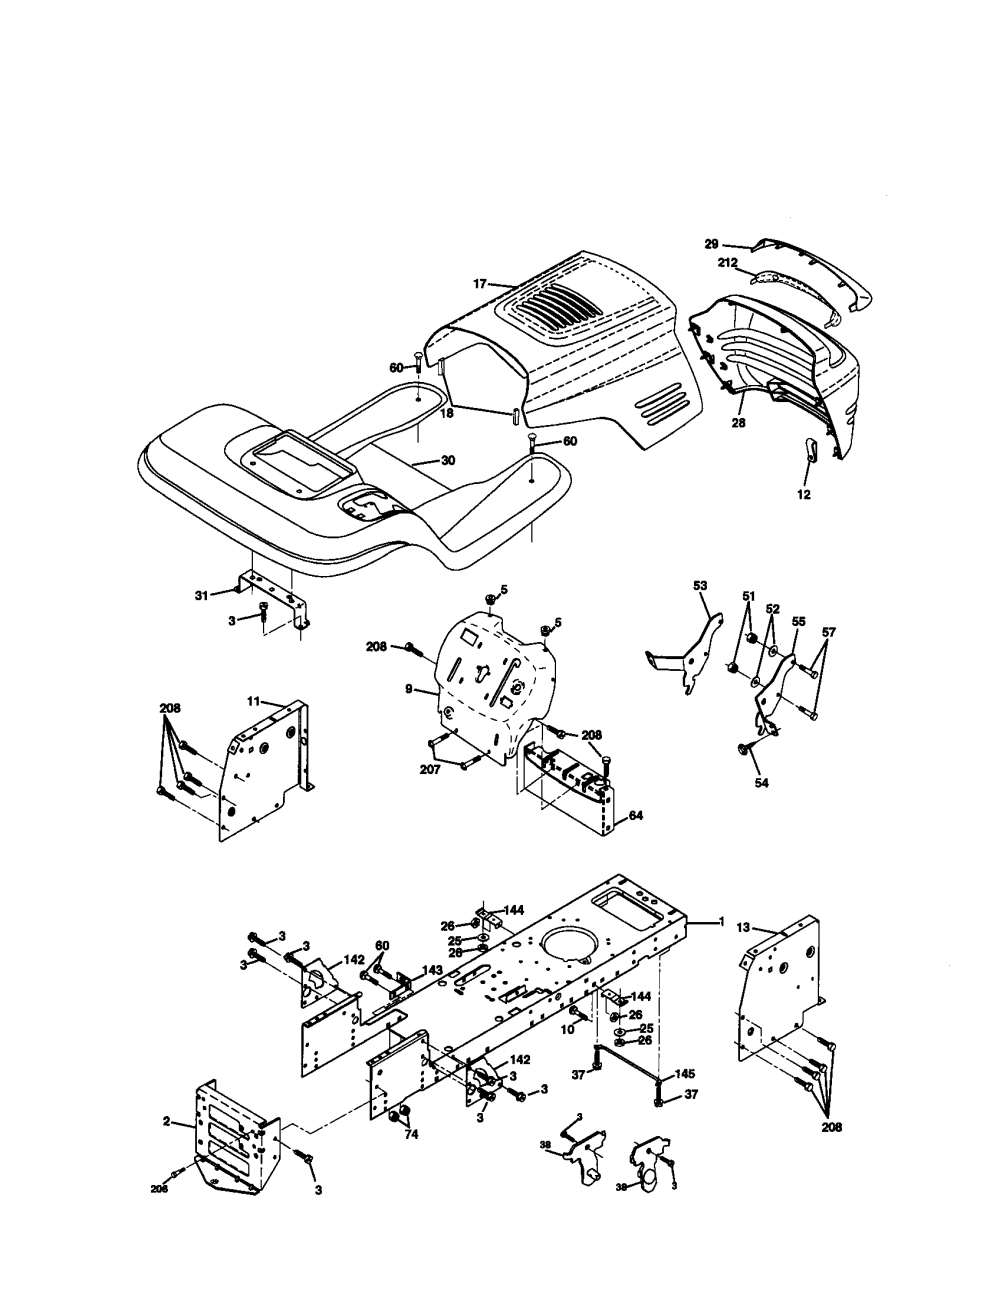 medium resolution of craftsman 917270671 chassis and enclosures diagram